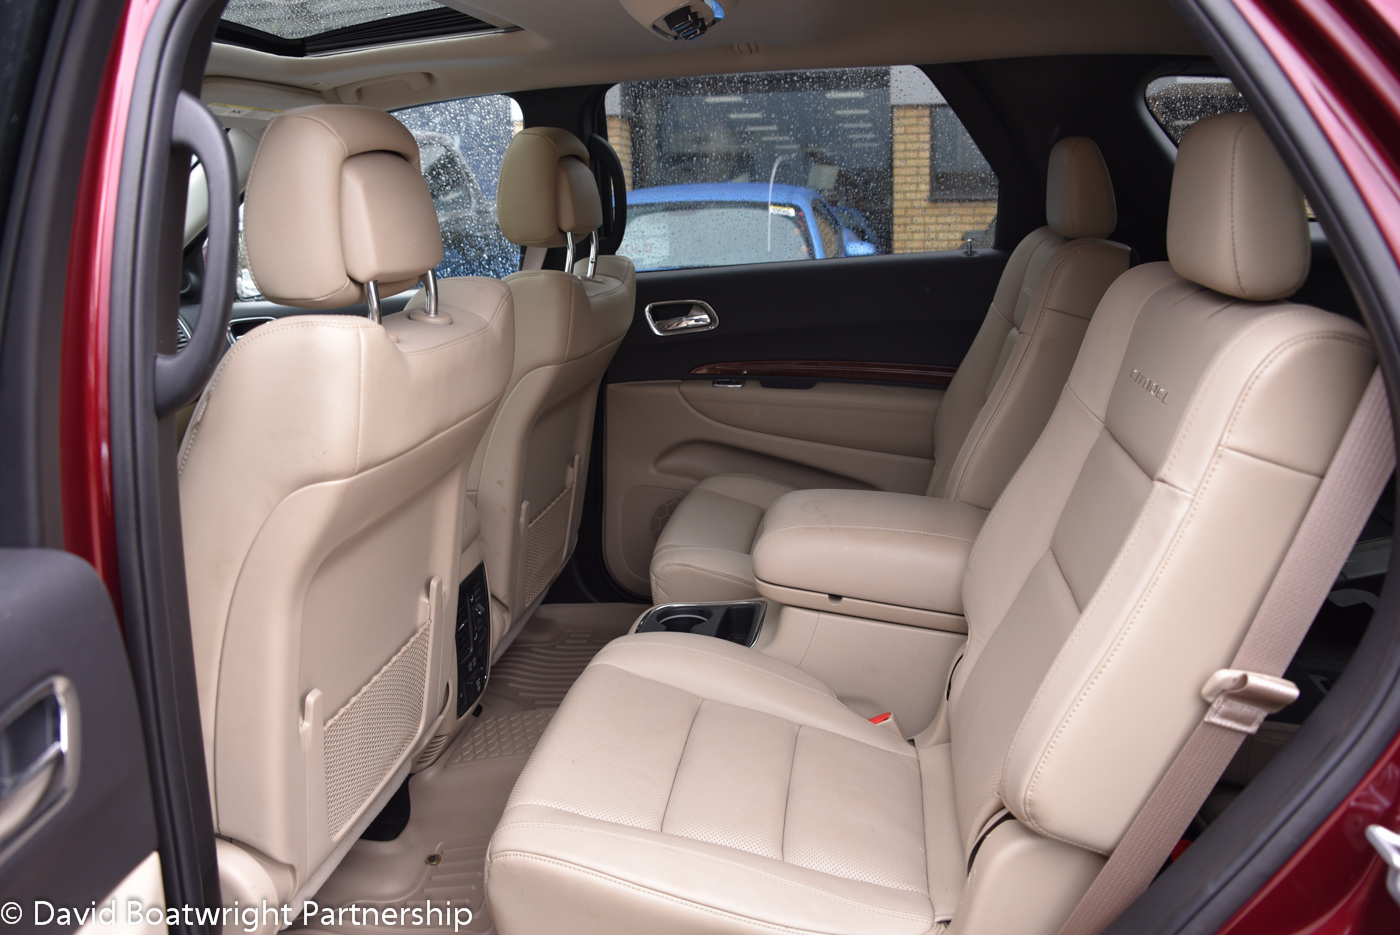 Dodge Durango 5.7 Litre V8 Hemi Six Seat MPV for sale in the UK